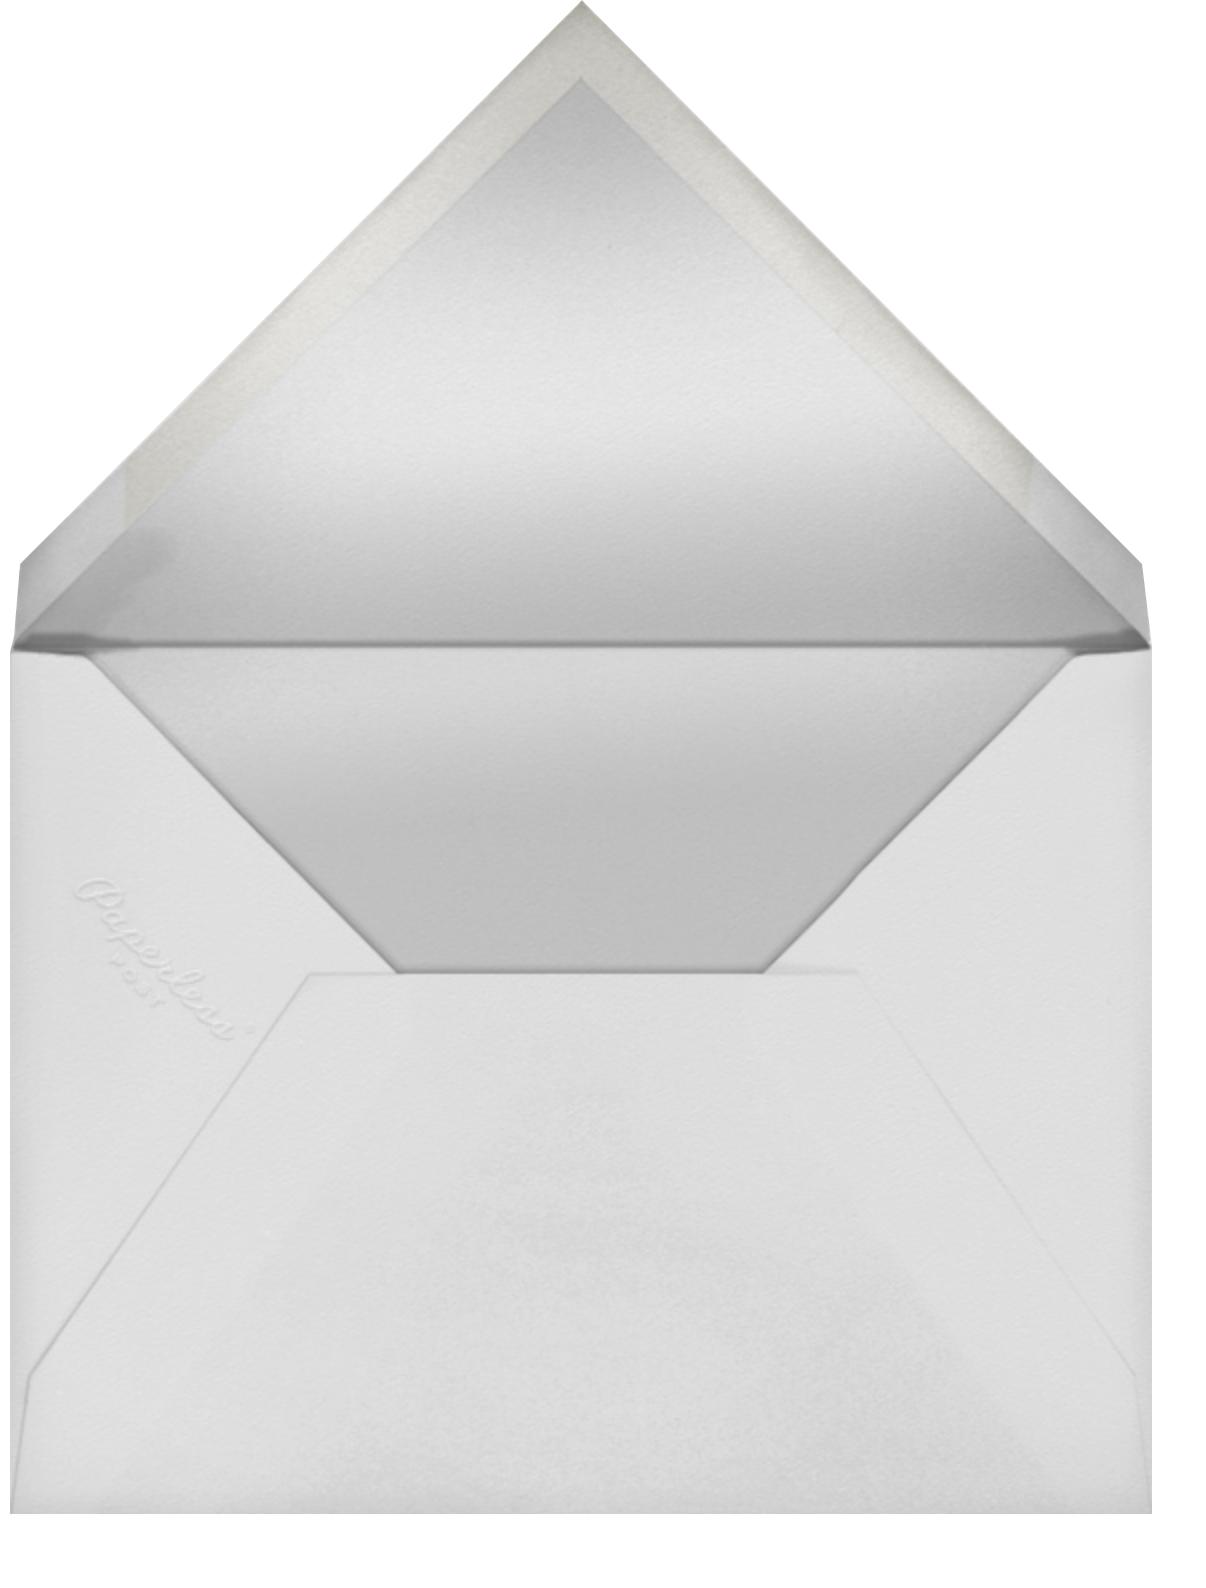 Lamina II (Menu) - Oyster - Paperless Post - Menus - envelope back